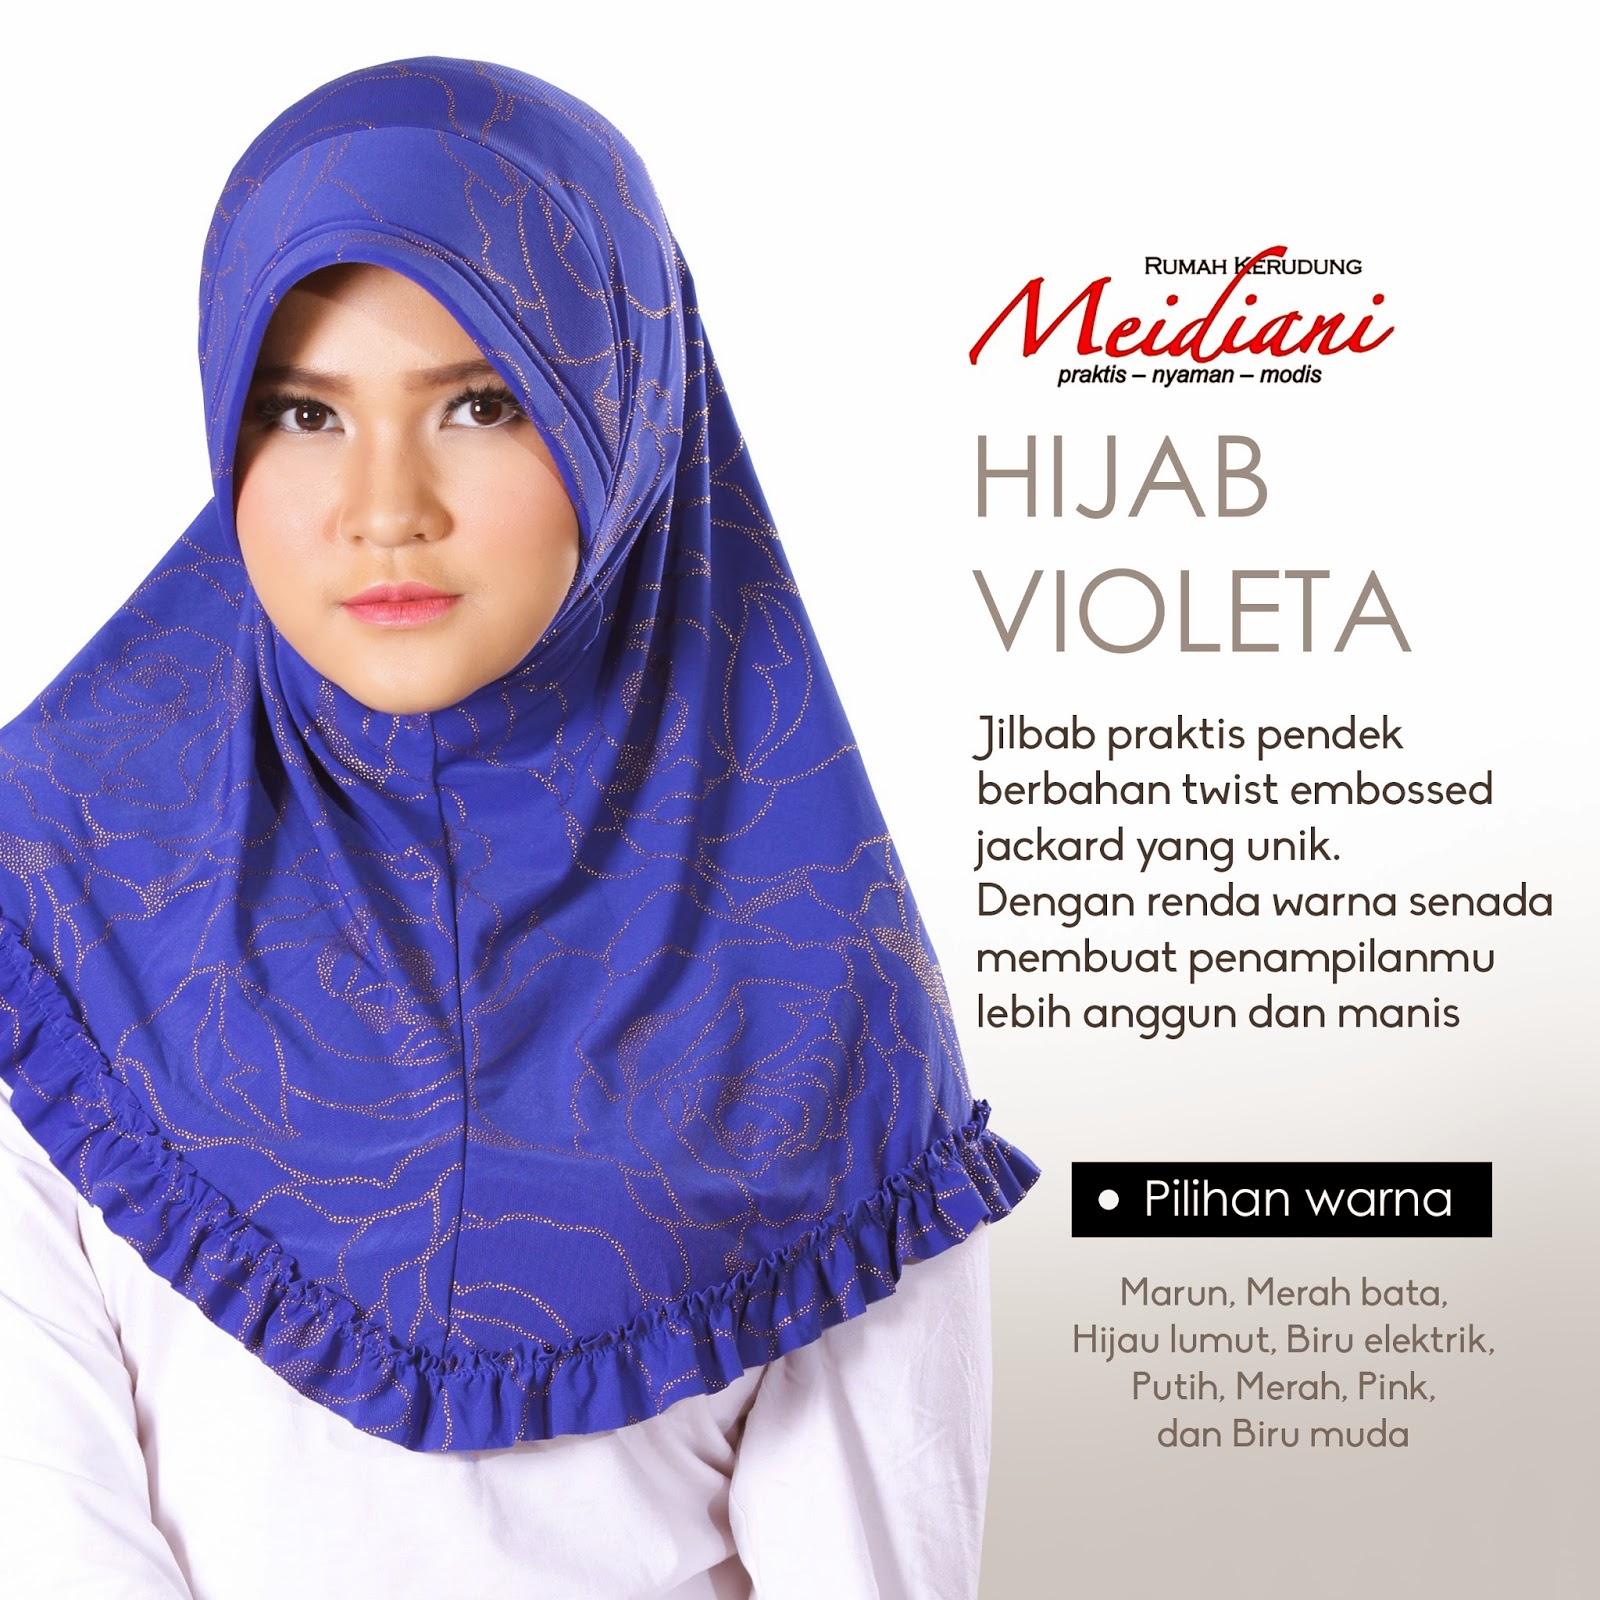 Hijab Violeta